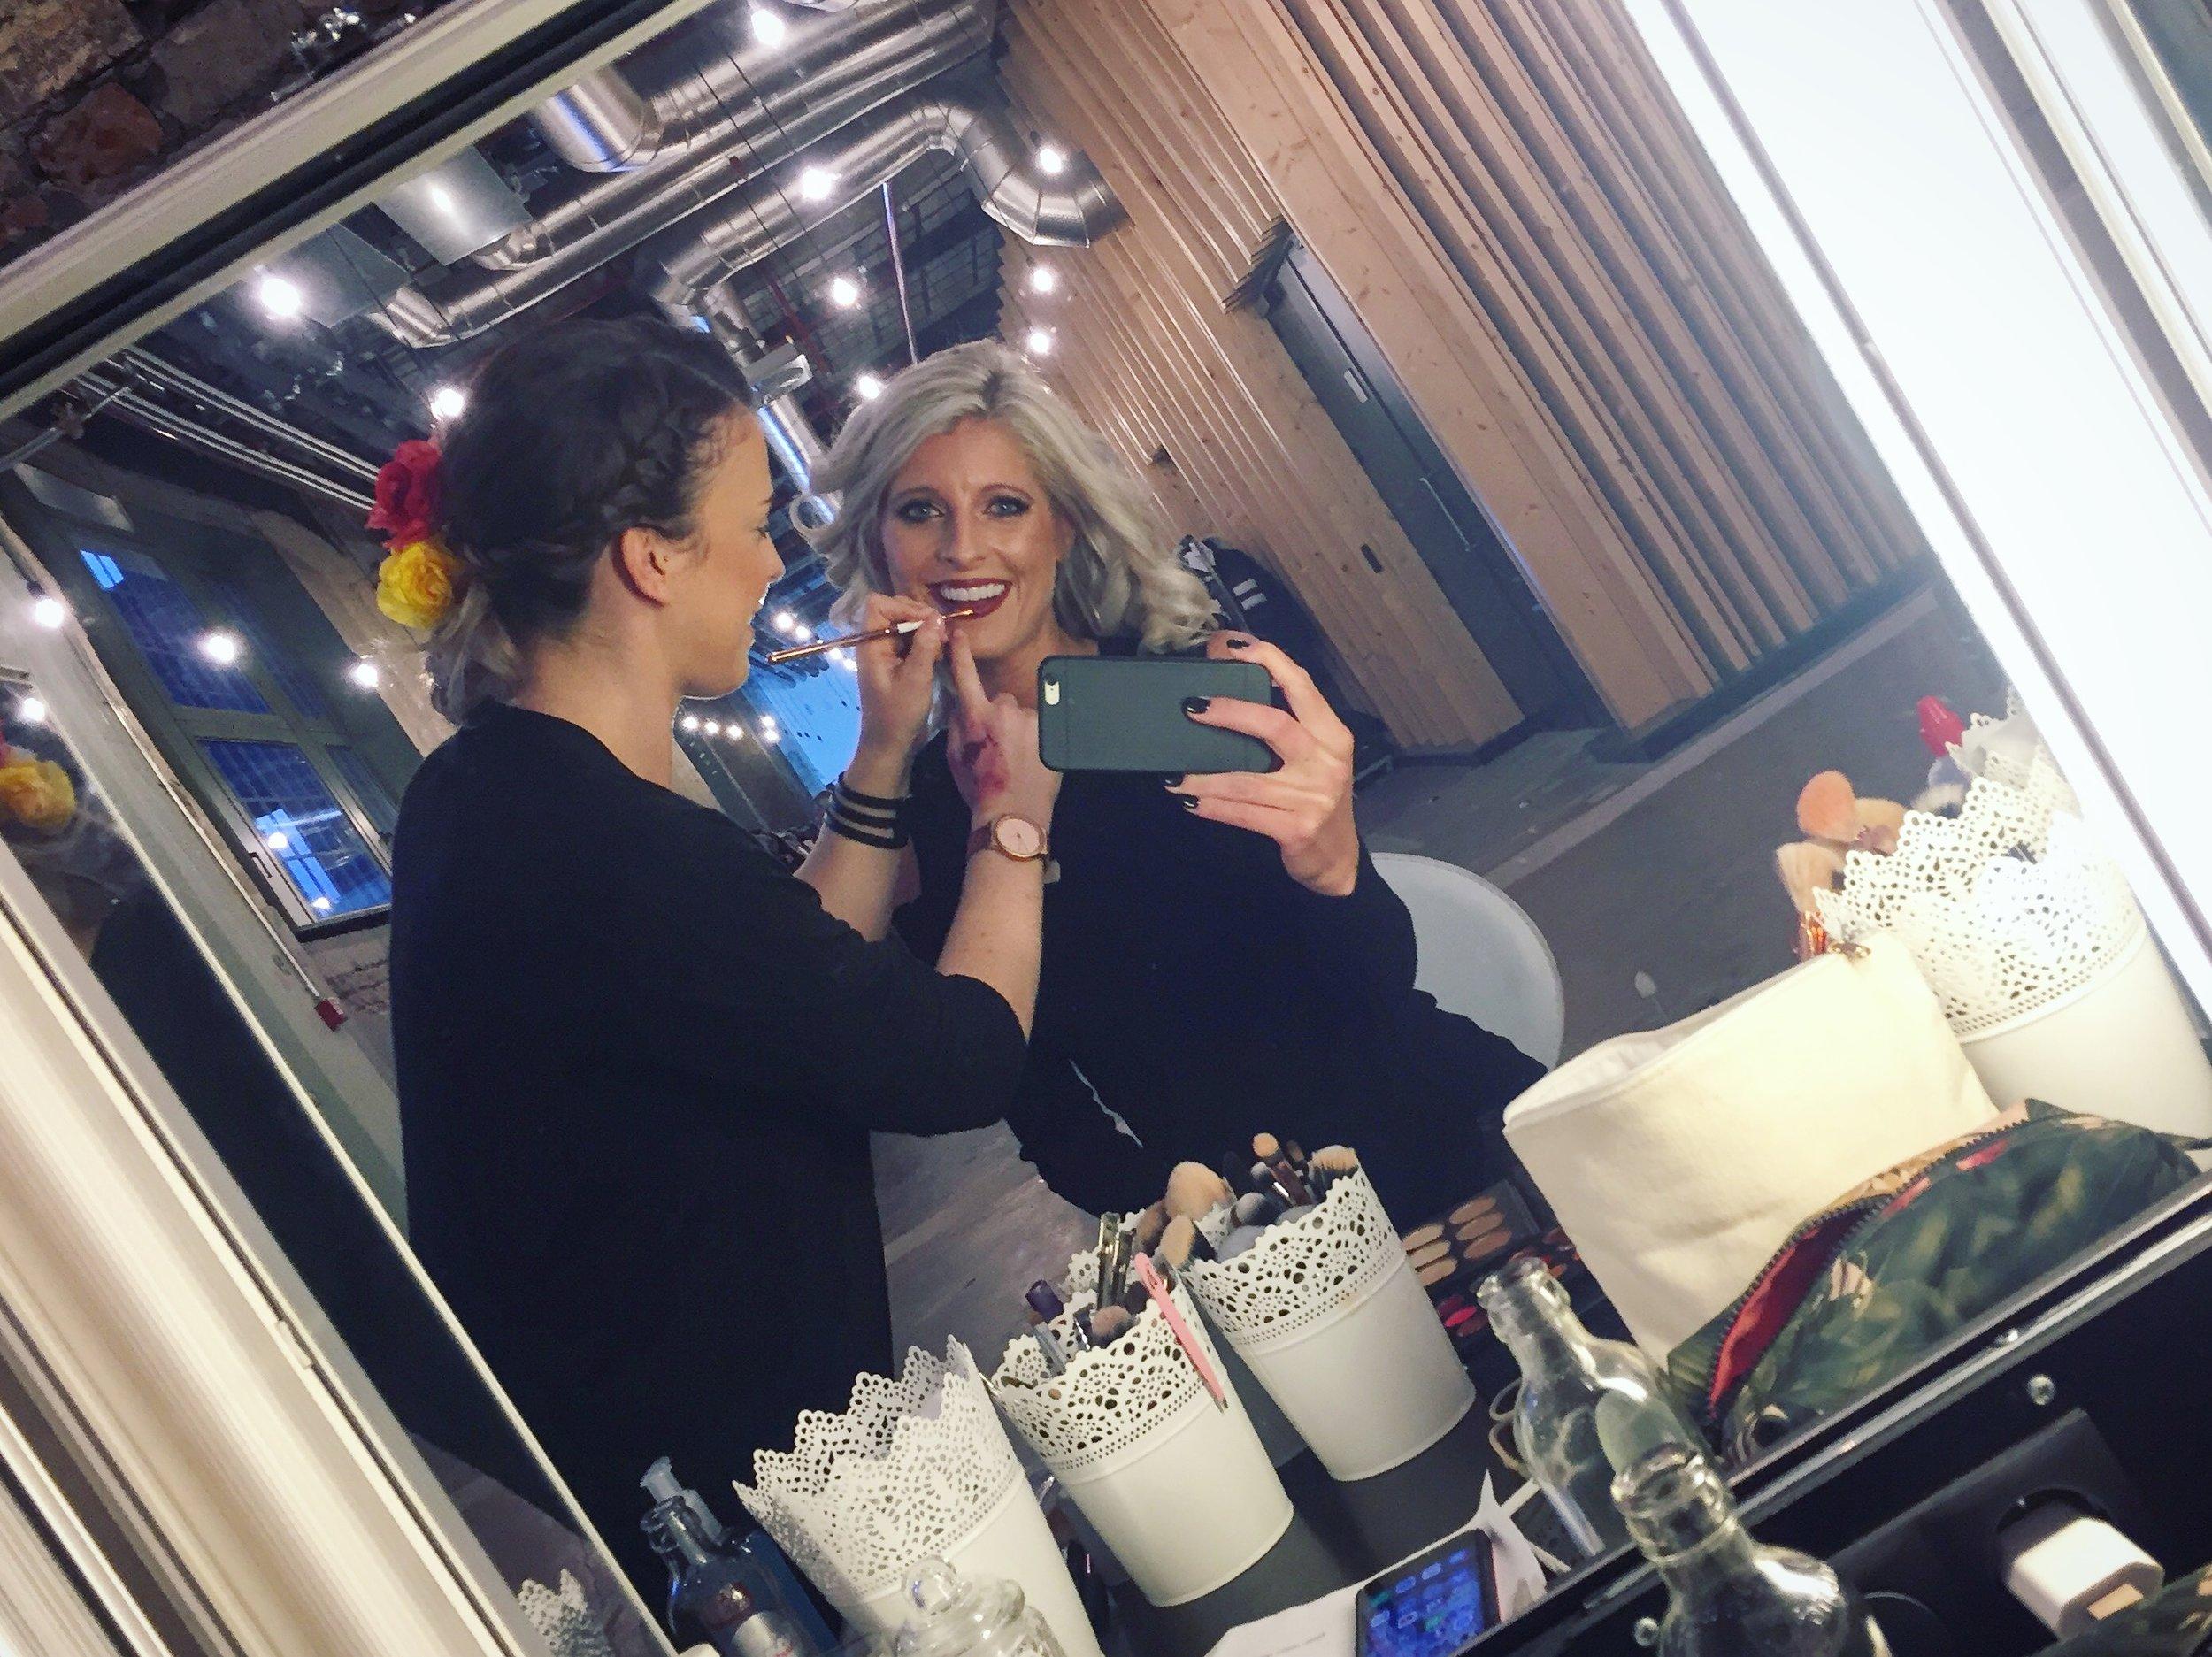 Fashion show backstage getting ready